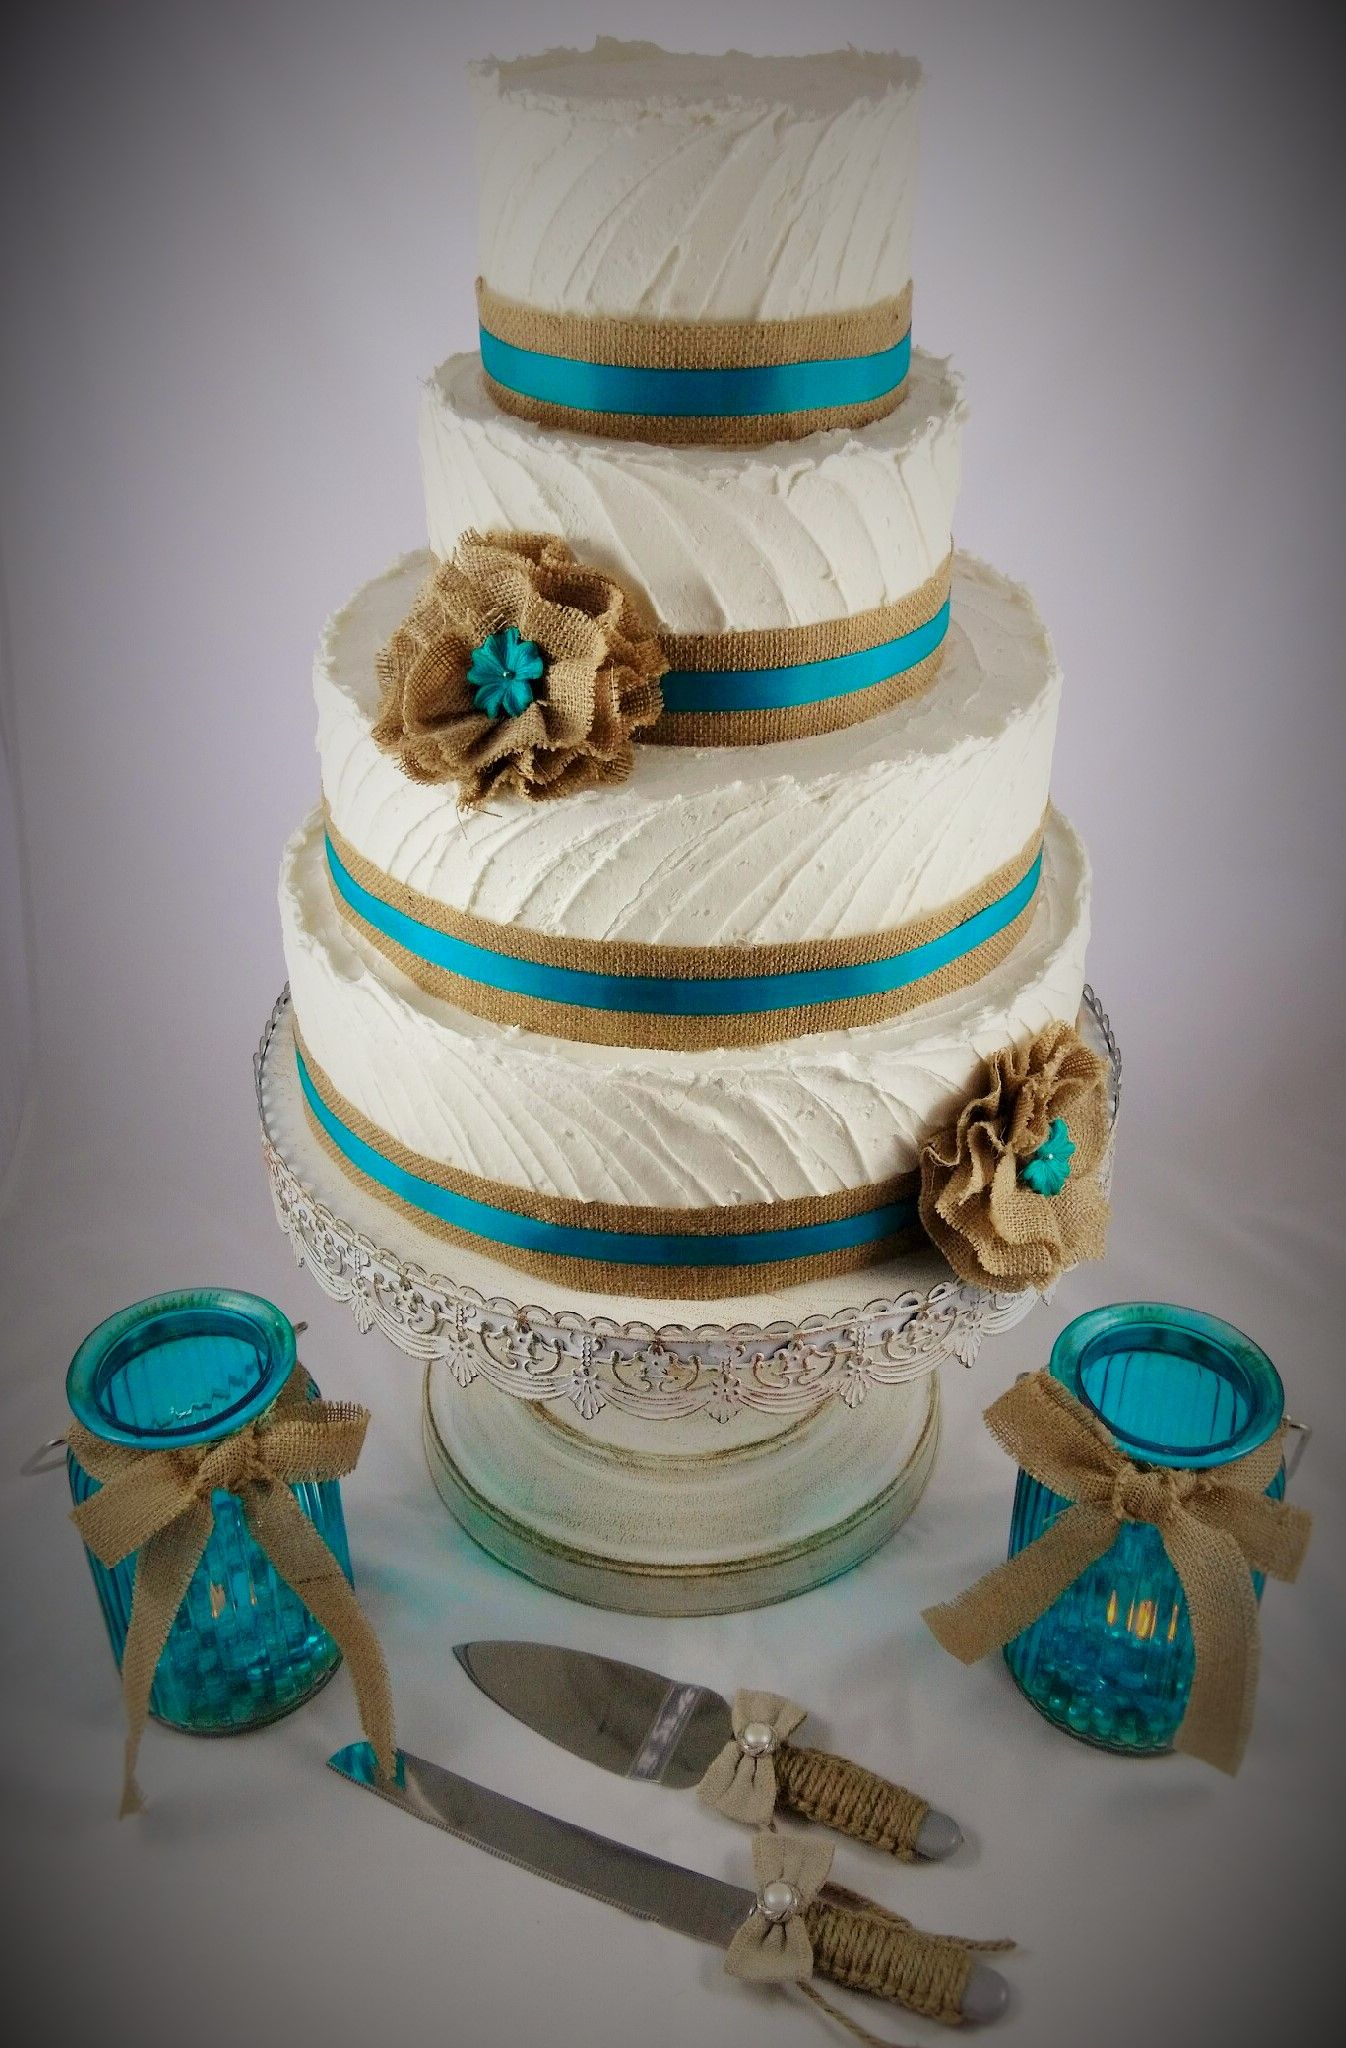 Rustic Wedding Cake Teal Burlap Cakes By Mn Https Www Facebook Cakesbymn8